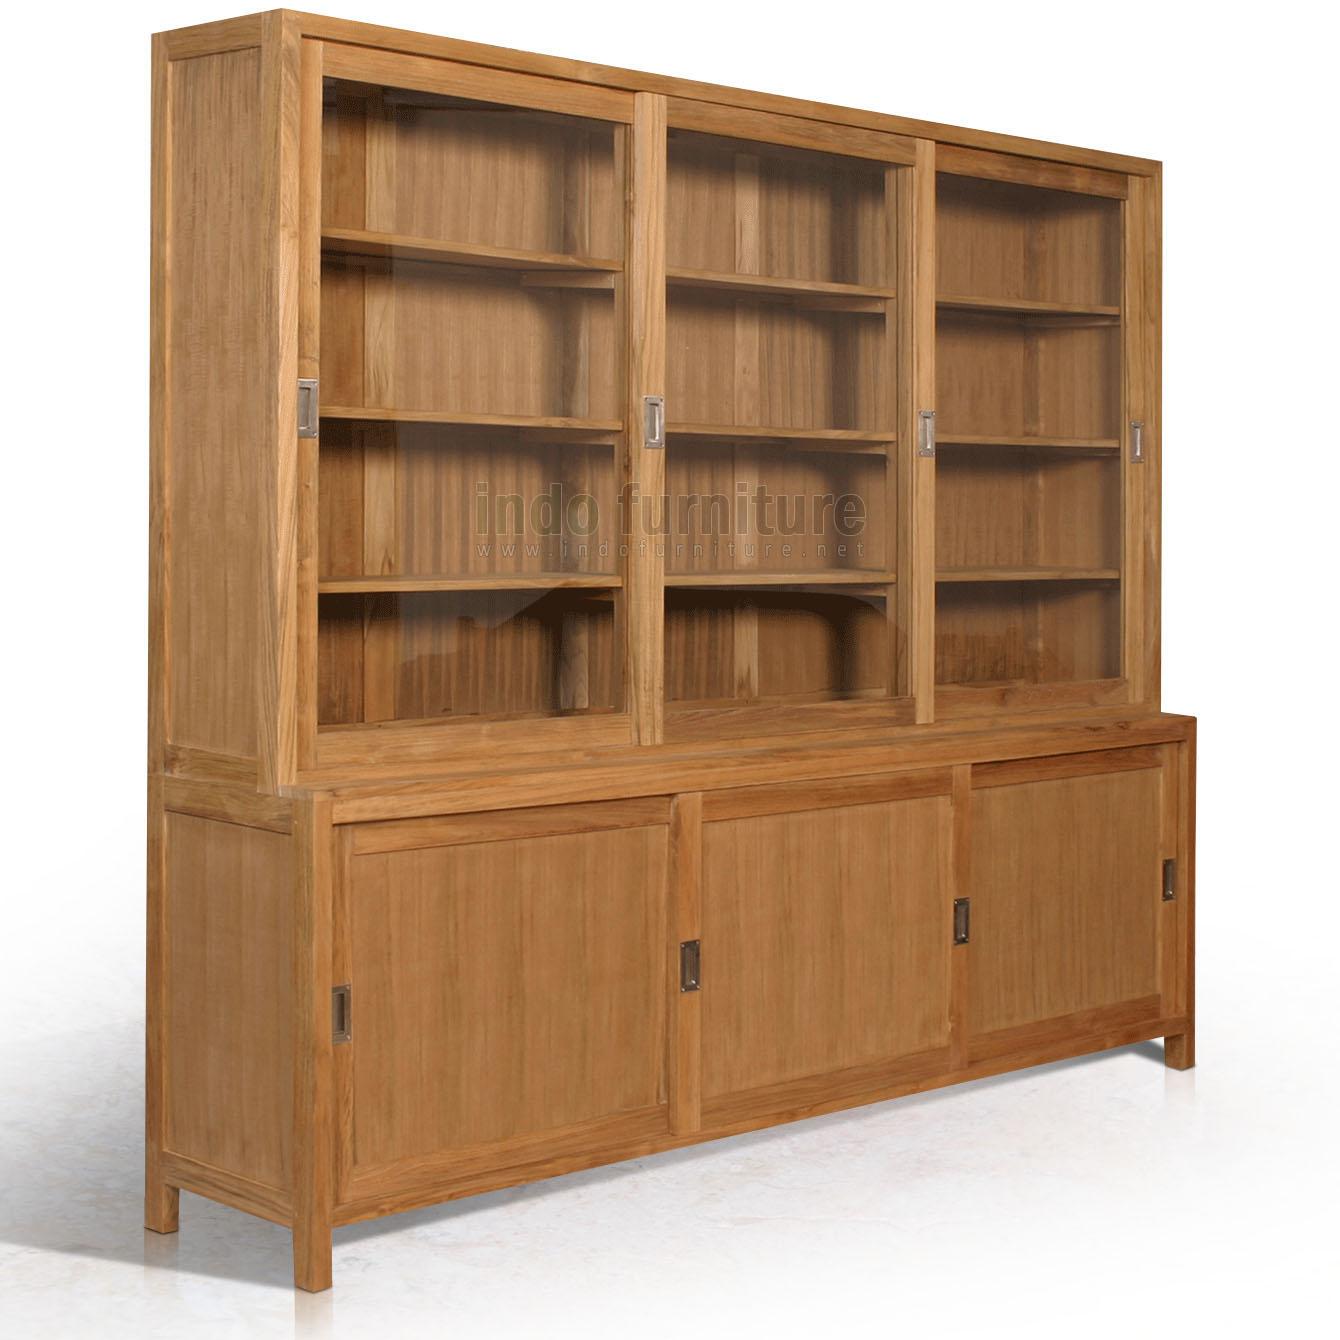 Wood furniture cabinet raya furniture.